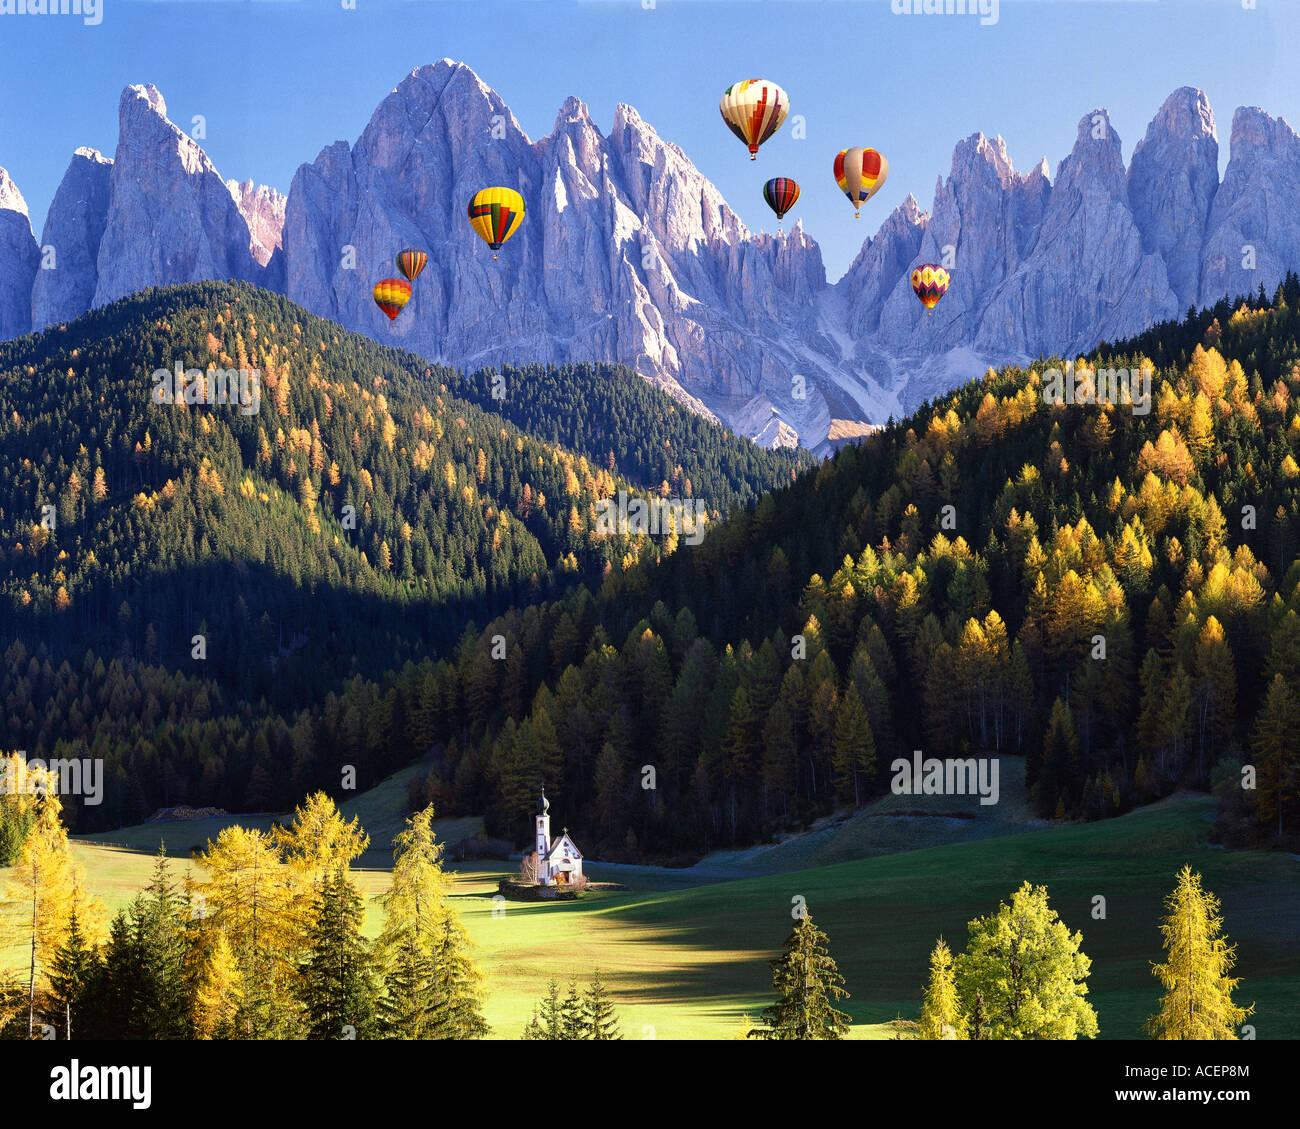 IT - DOLOMITES:  St. Johann in Ranui and Geisler Spitzen Mountains - Stock Image